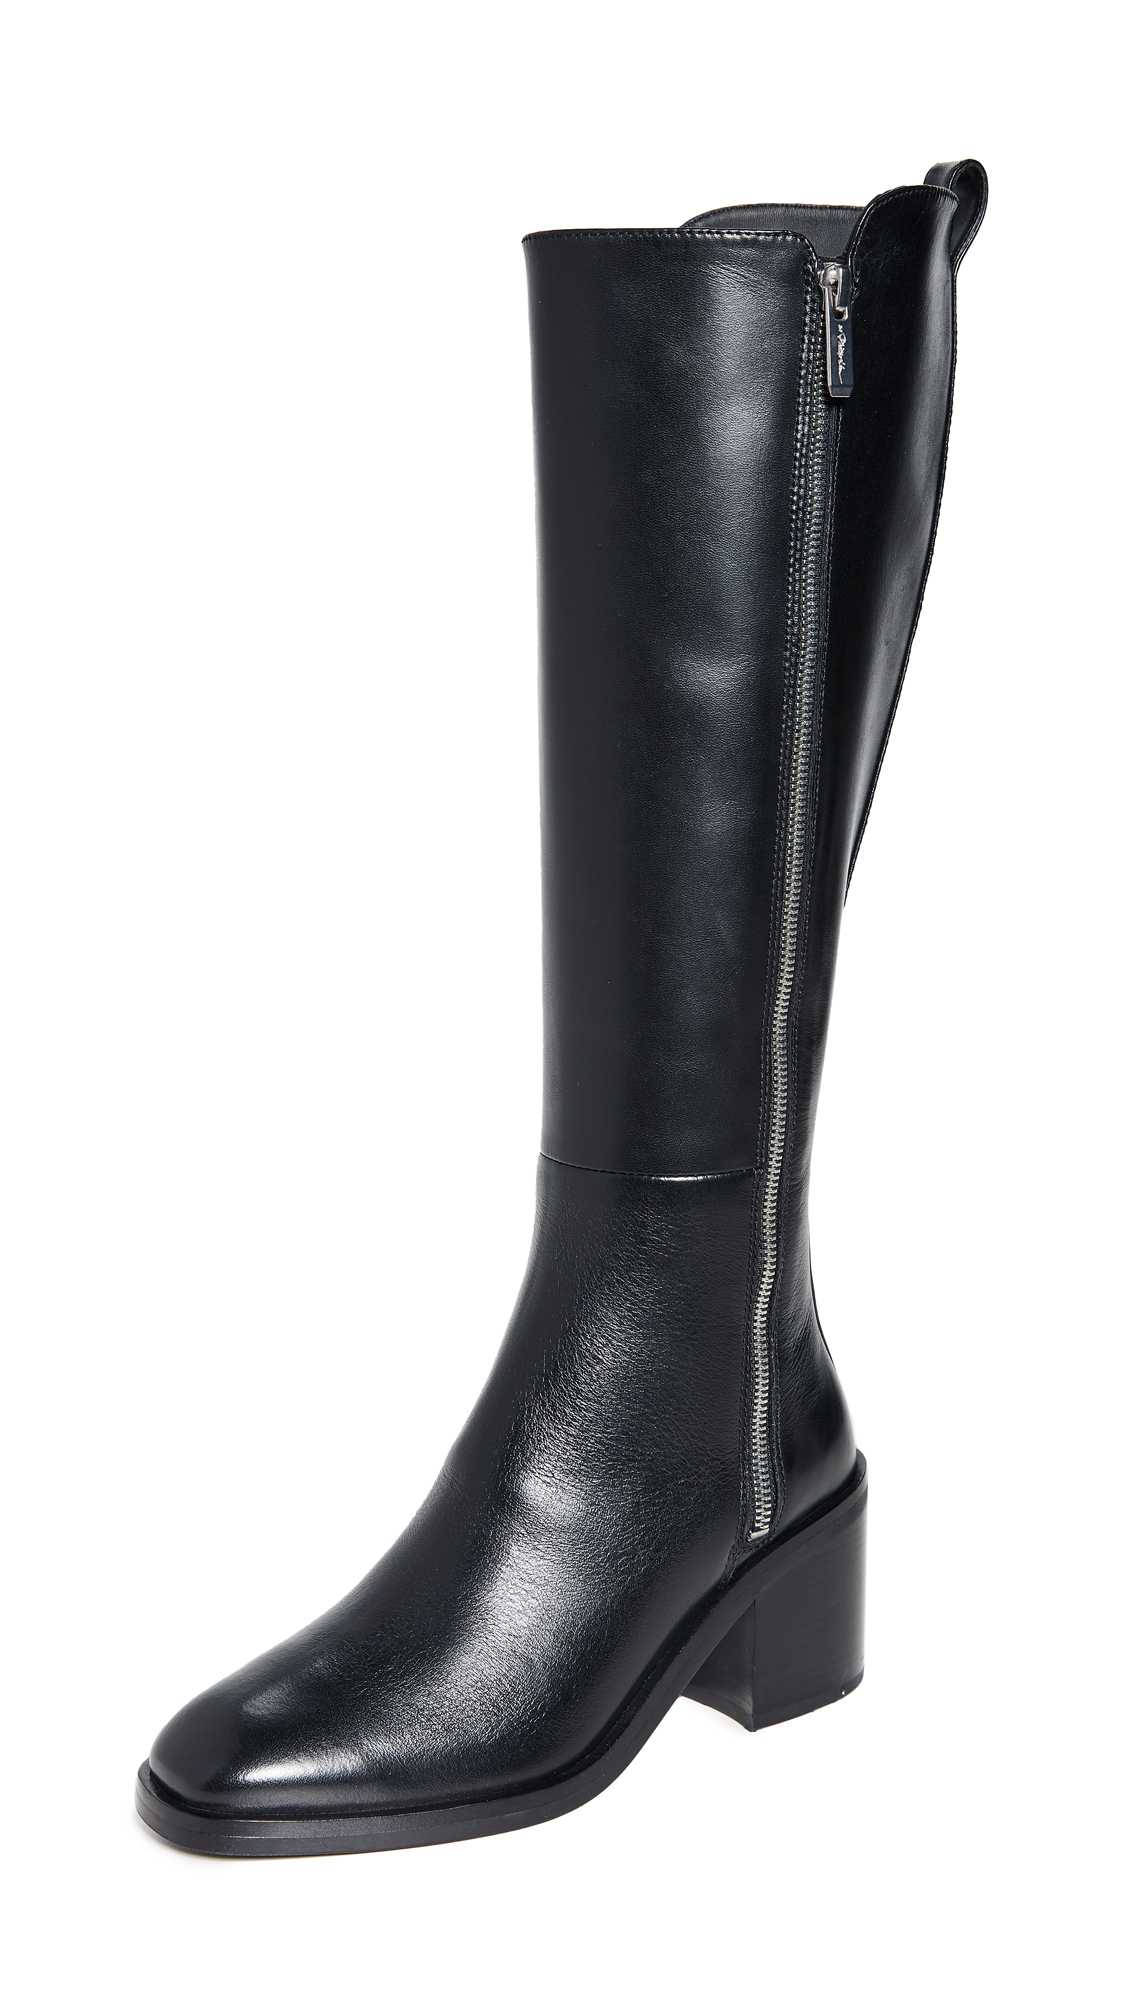 Buy 3.1 Phillip Lim Alexa 70mm Tall Boots online, shop 3.1 Phillip Lim